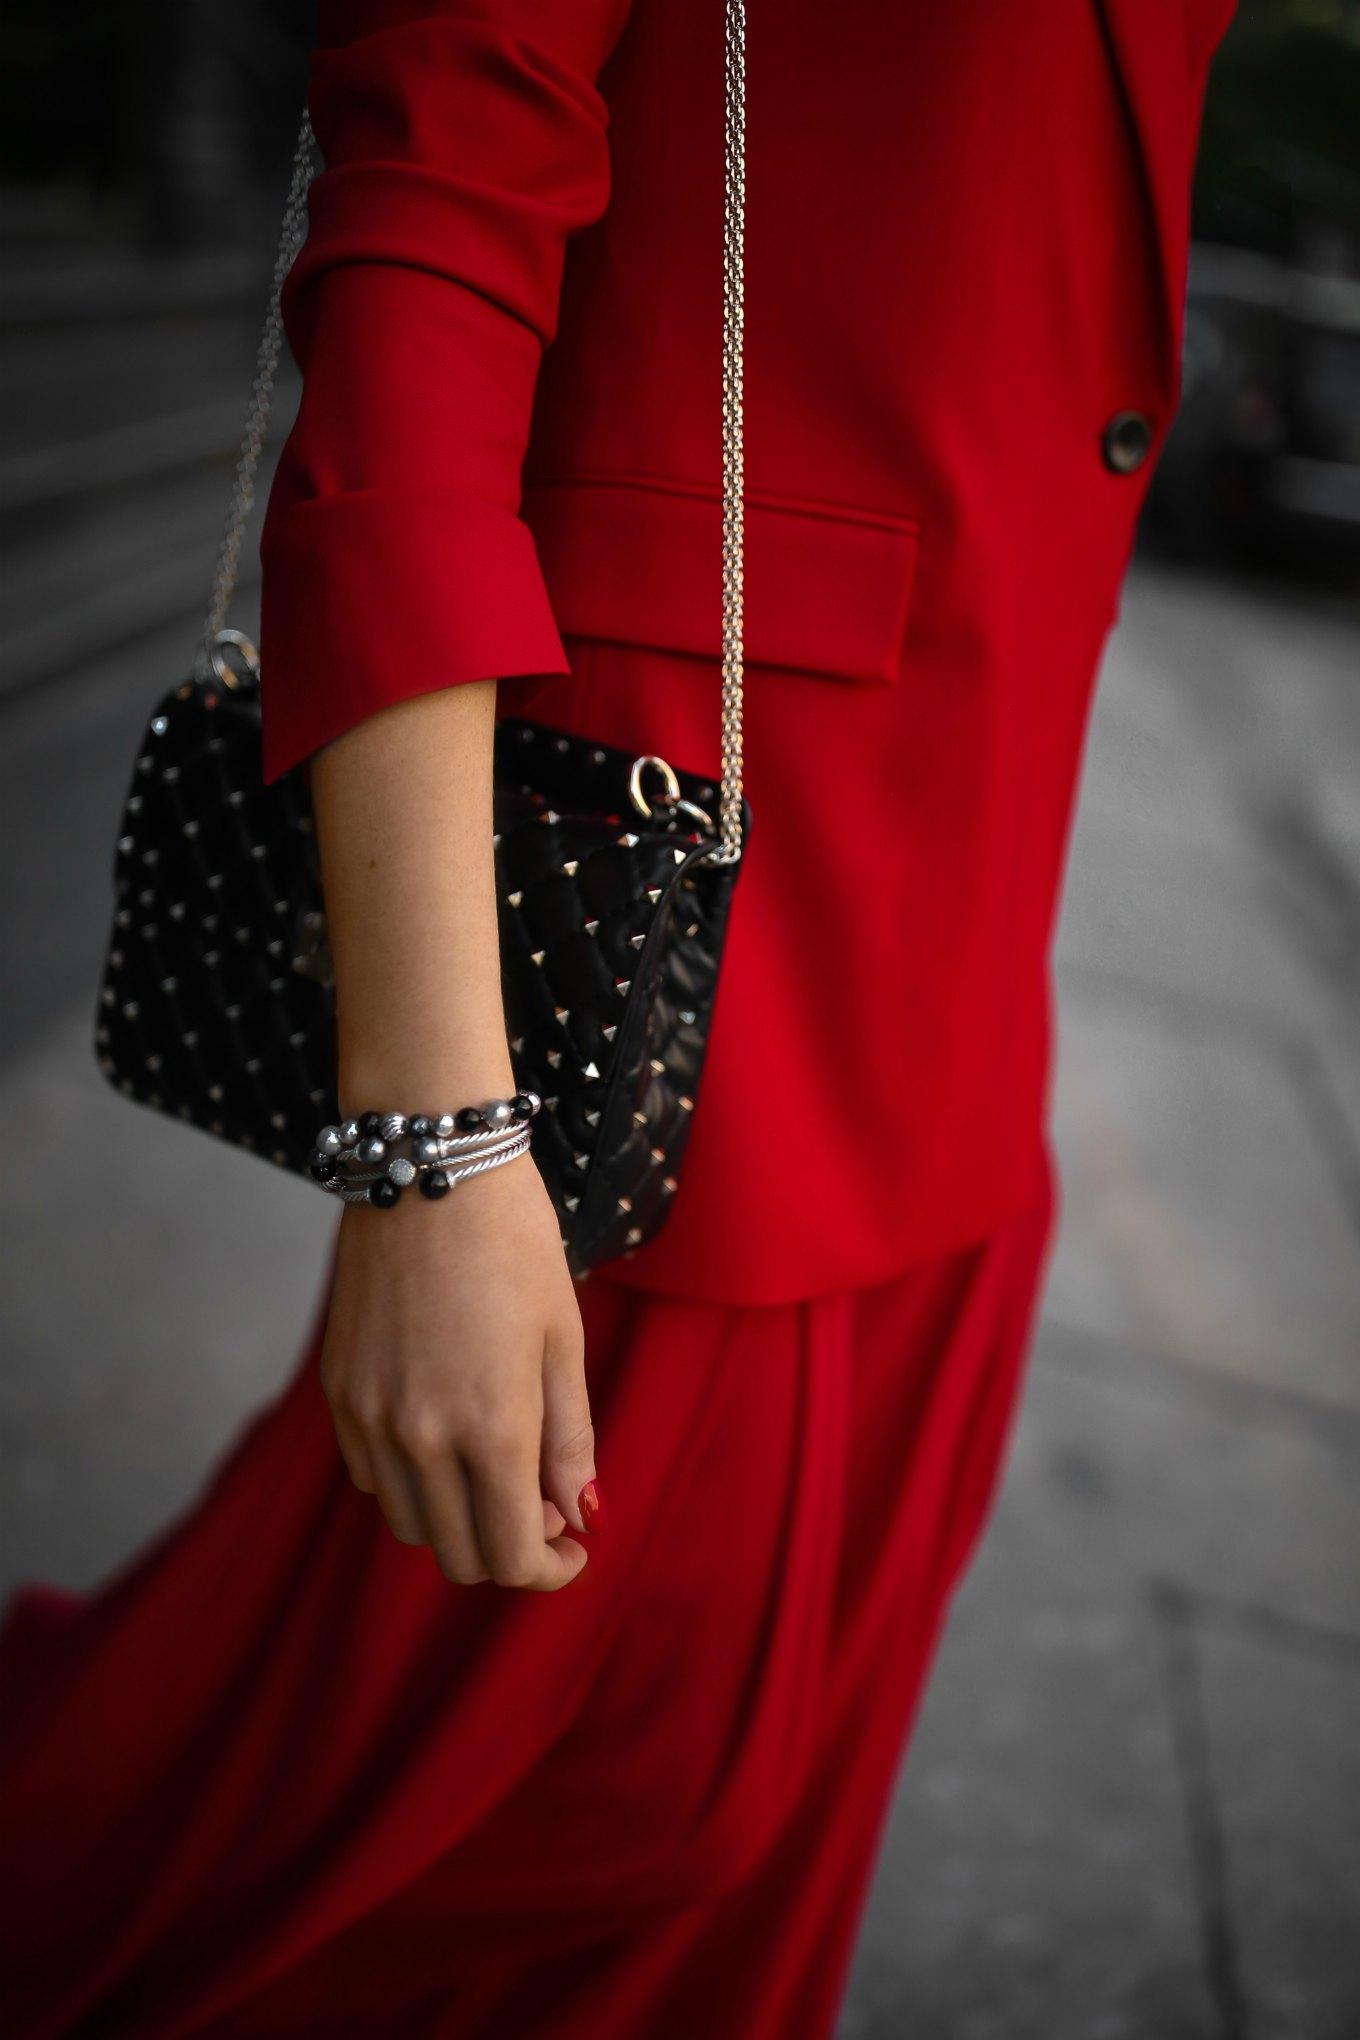 Mary Orton of Memorandum wears a Sara Battaglia red longline blazer, wide-leg pleated red trousers, a black Valentino studded leather shoulder bag and stacked David Yurman Solari bracelets